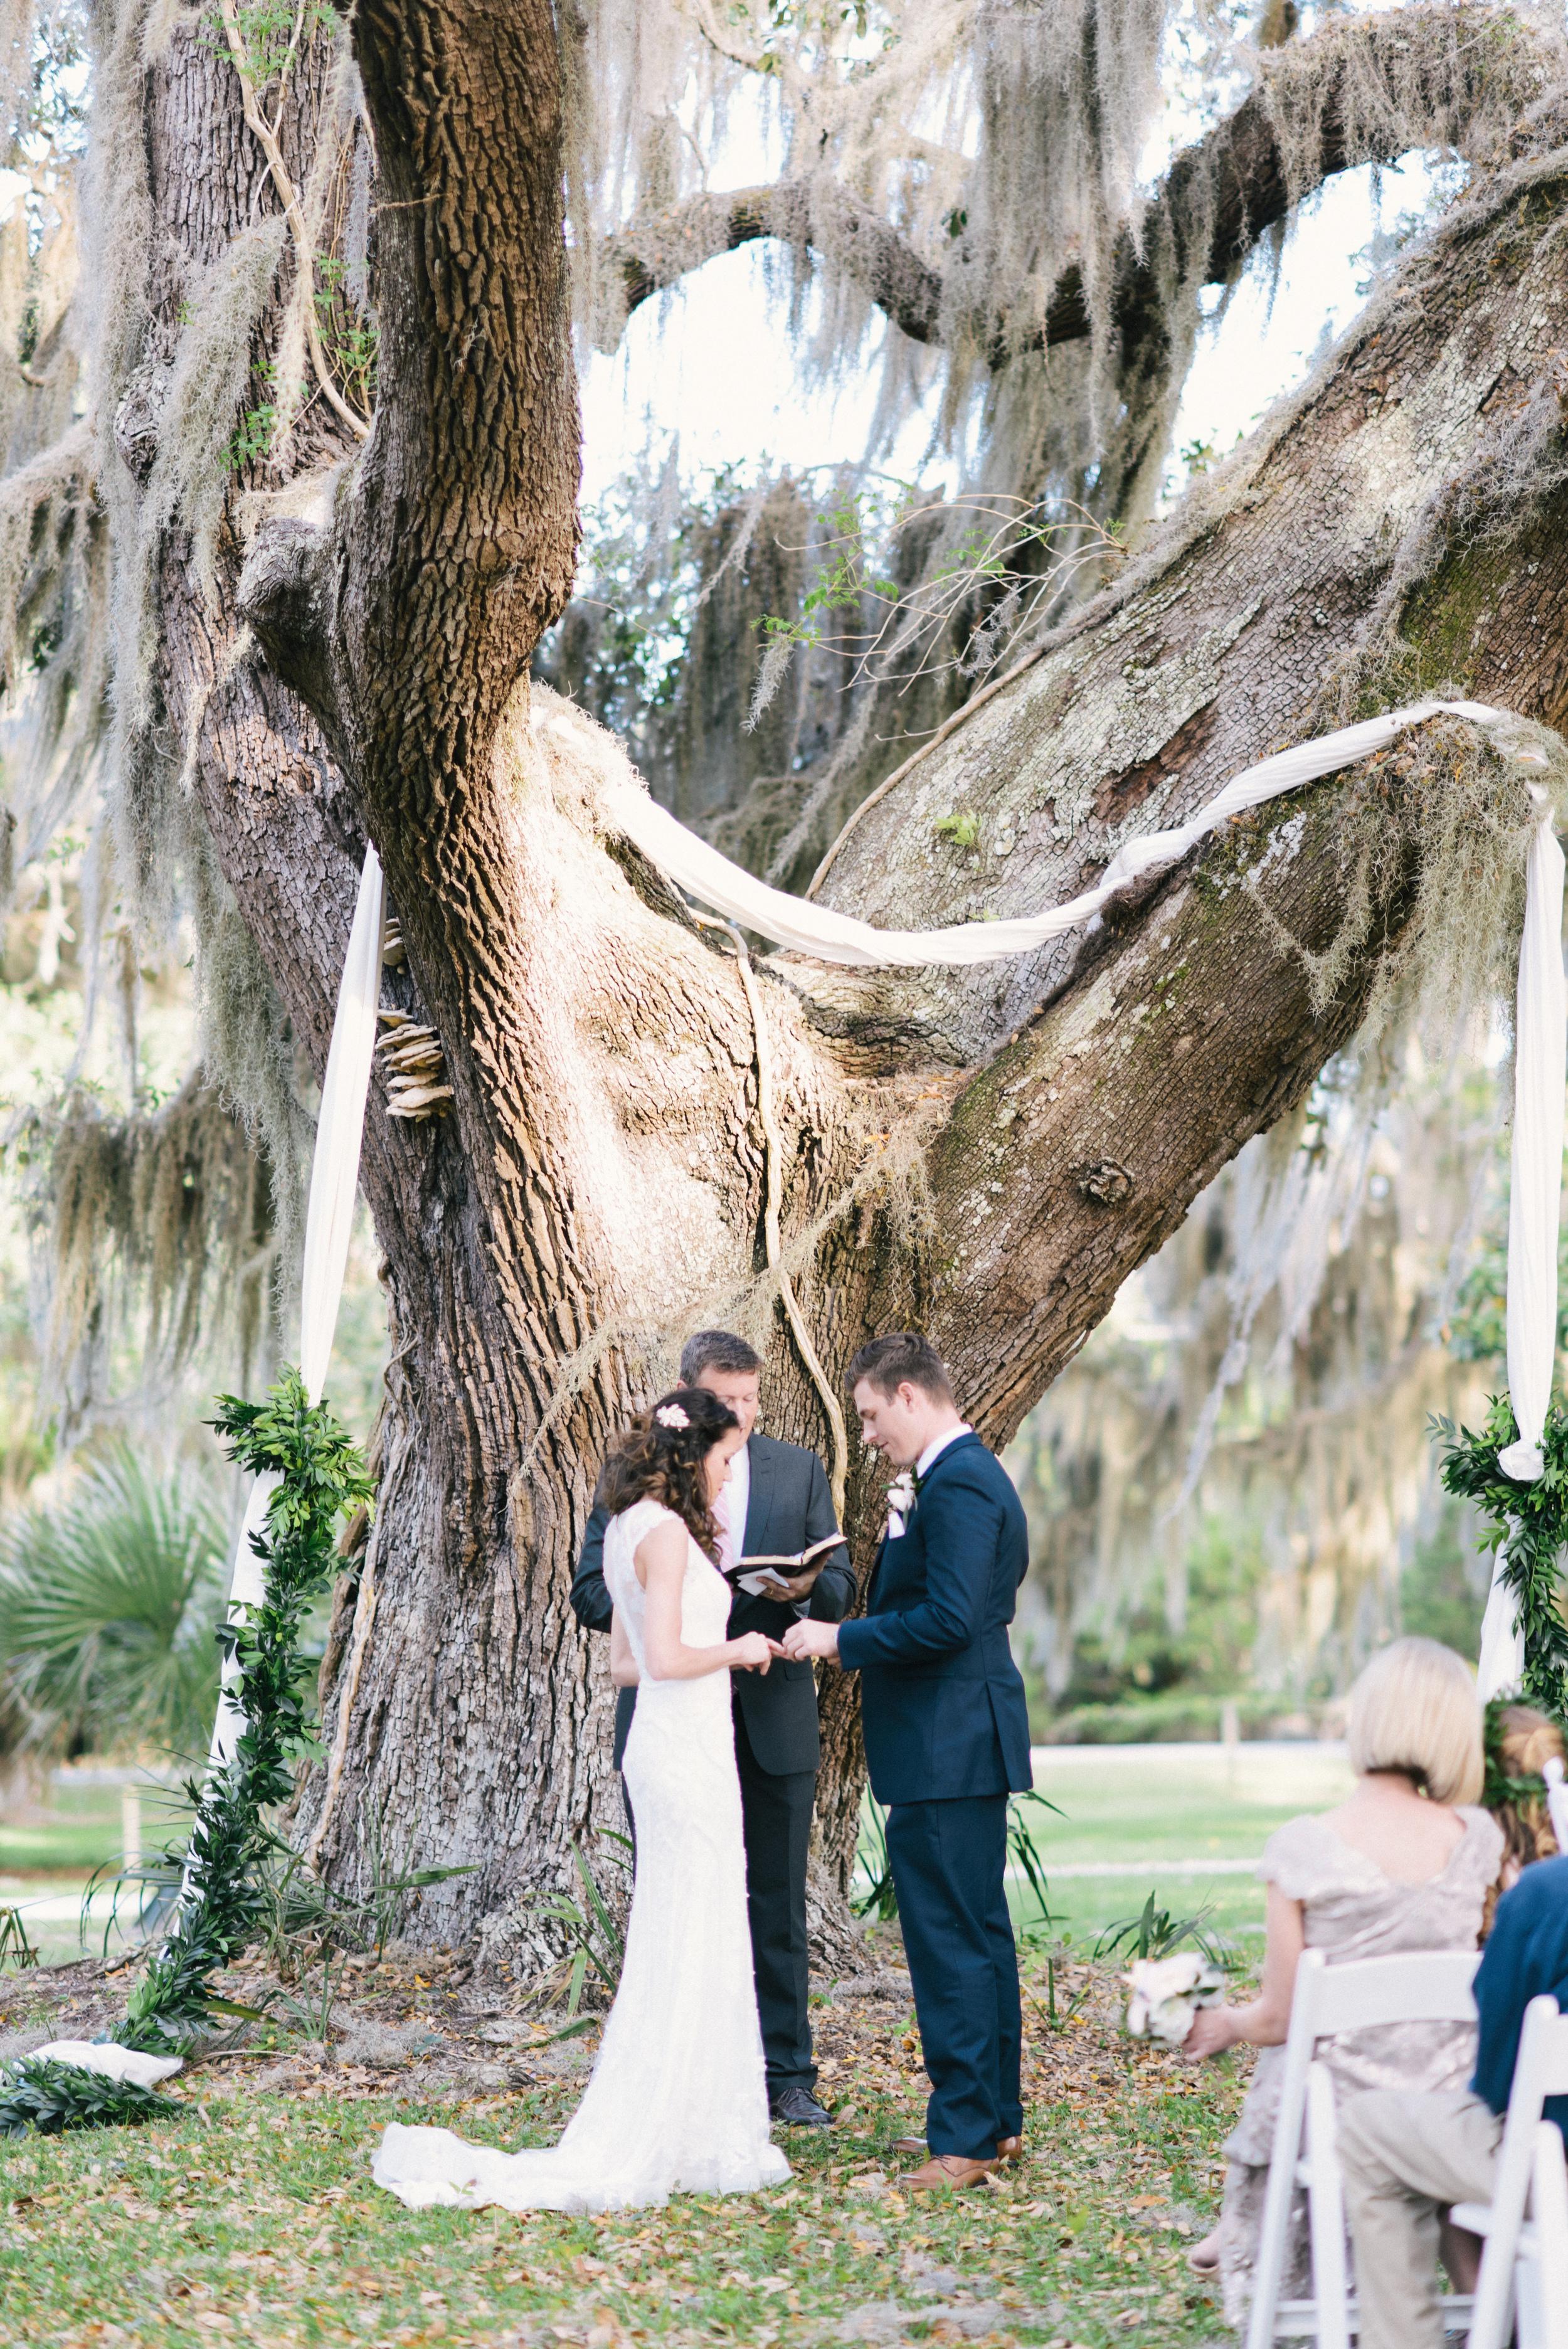 kadi-and-matt-carroll-april-9-2016-jekyl-island-wedding-m-newsom-photography- (496 of 744).jpg